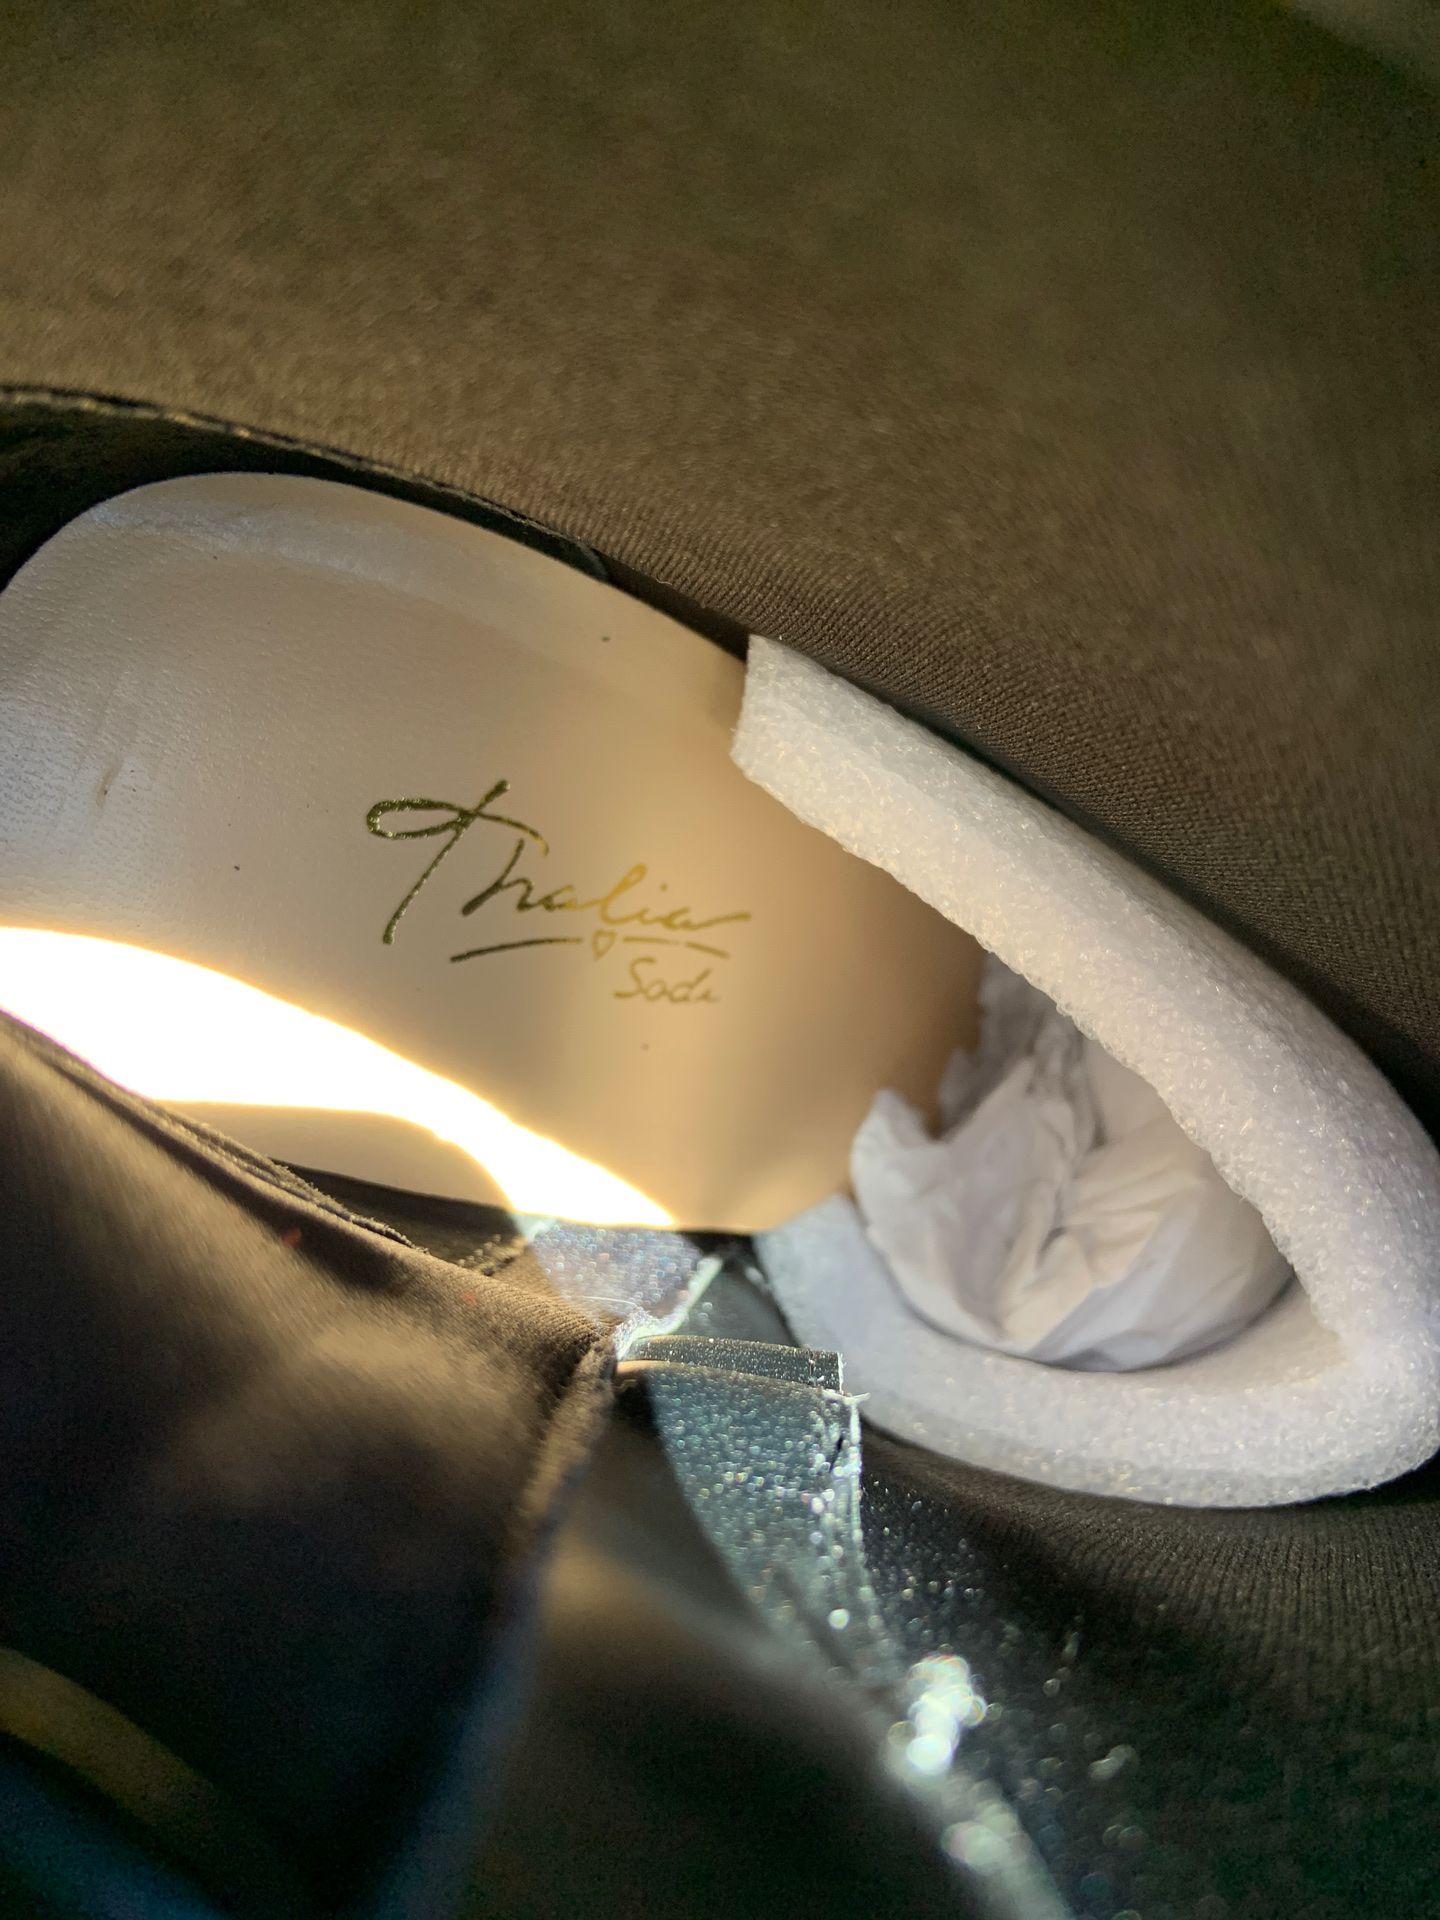 Silver ladies dress shoes